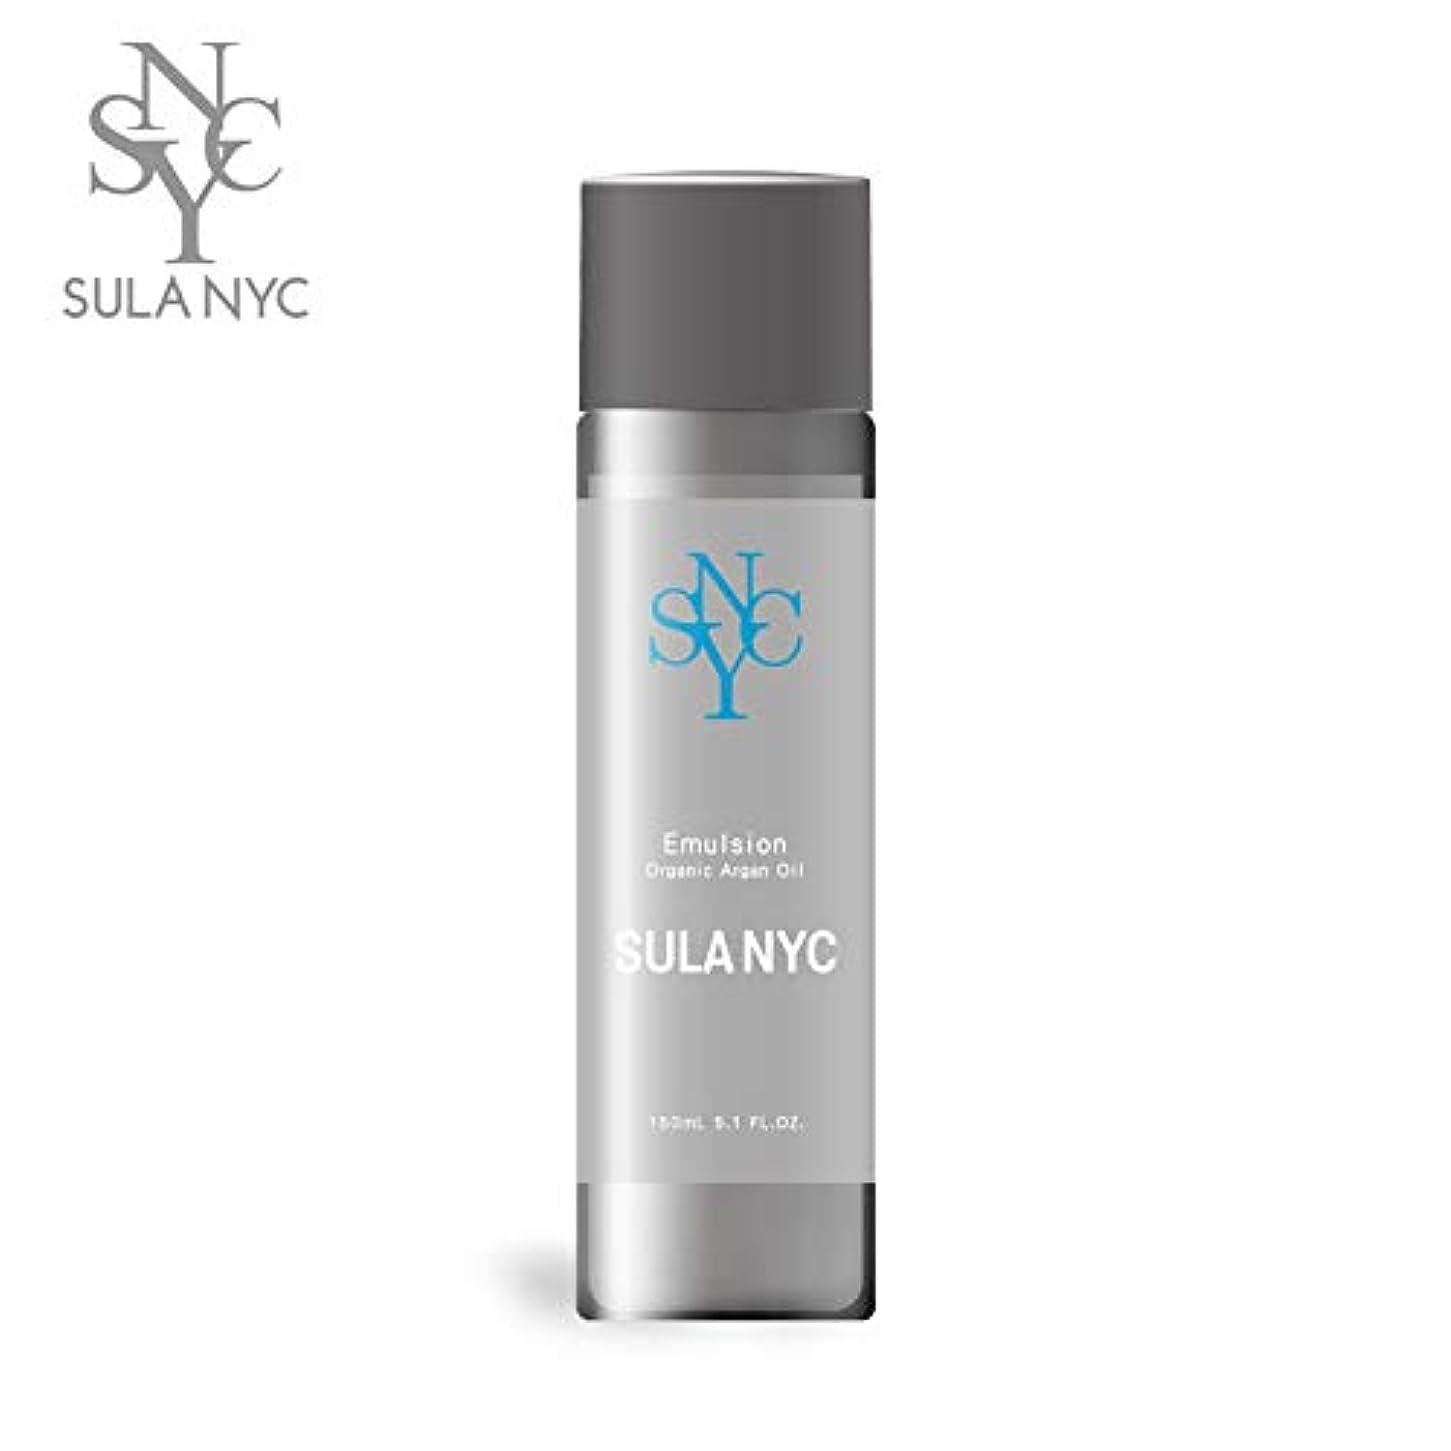 SULA NYC スーラ エヌワイシー エマルジョン 乳液 150ml アルガンオイル